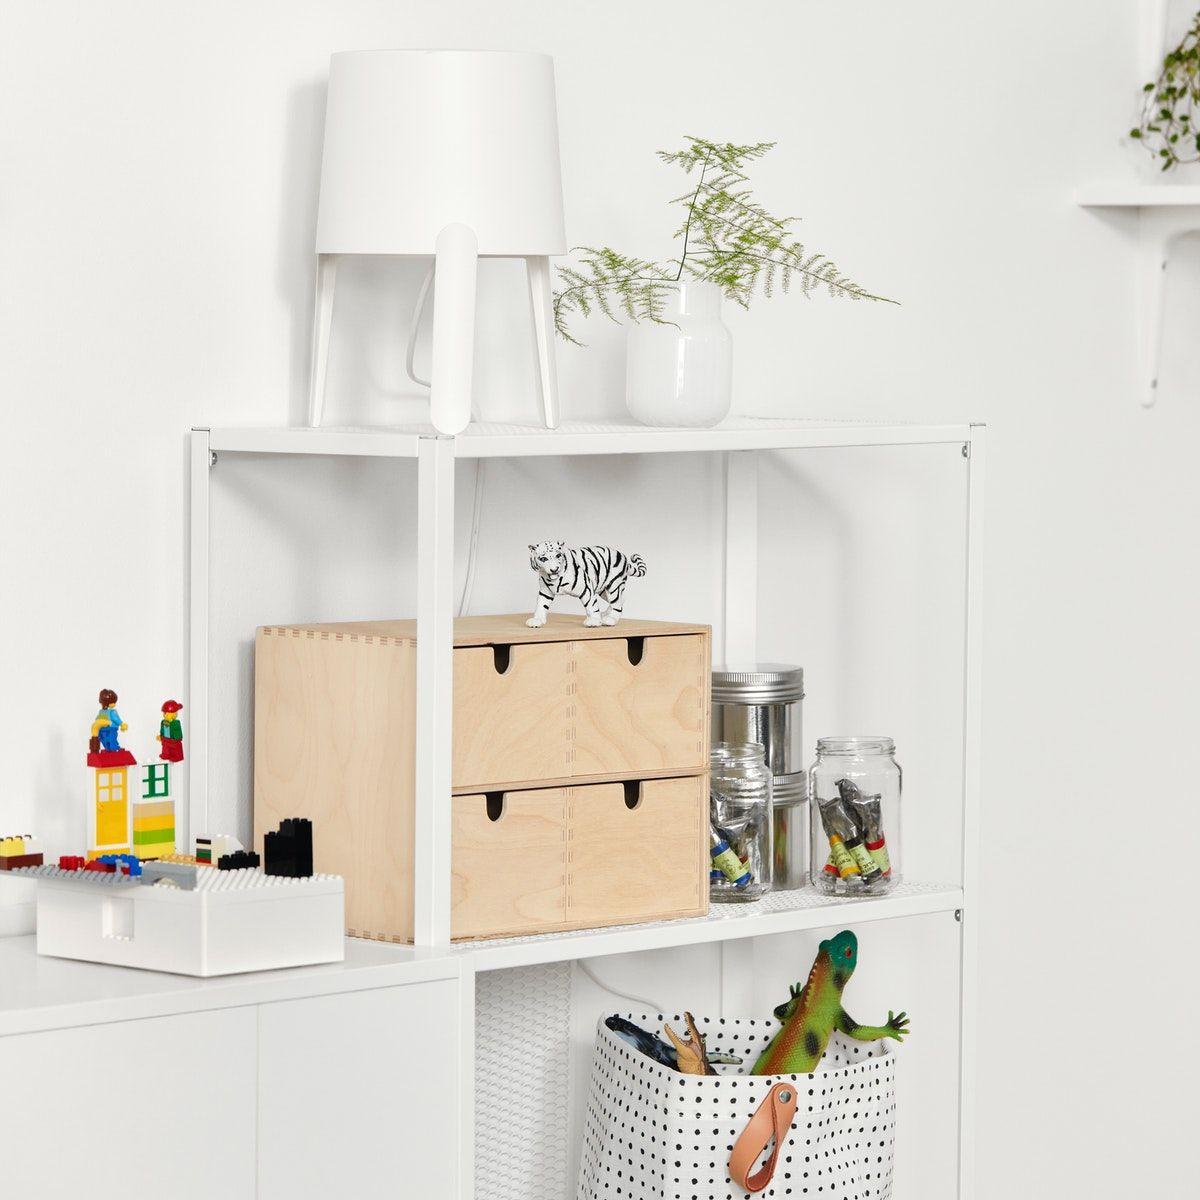 idSHOW,後疫情時代,裝修趨勢,IKEA